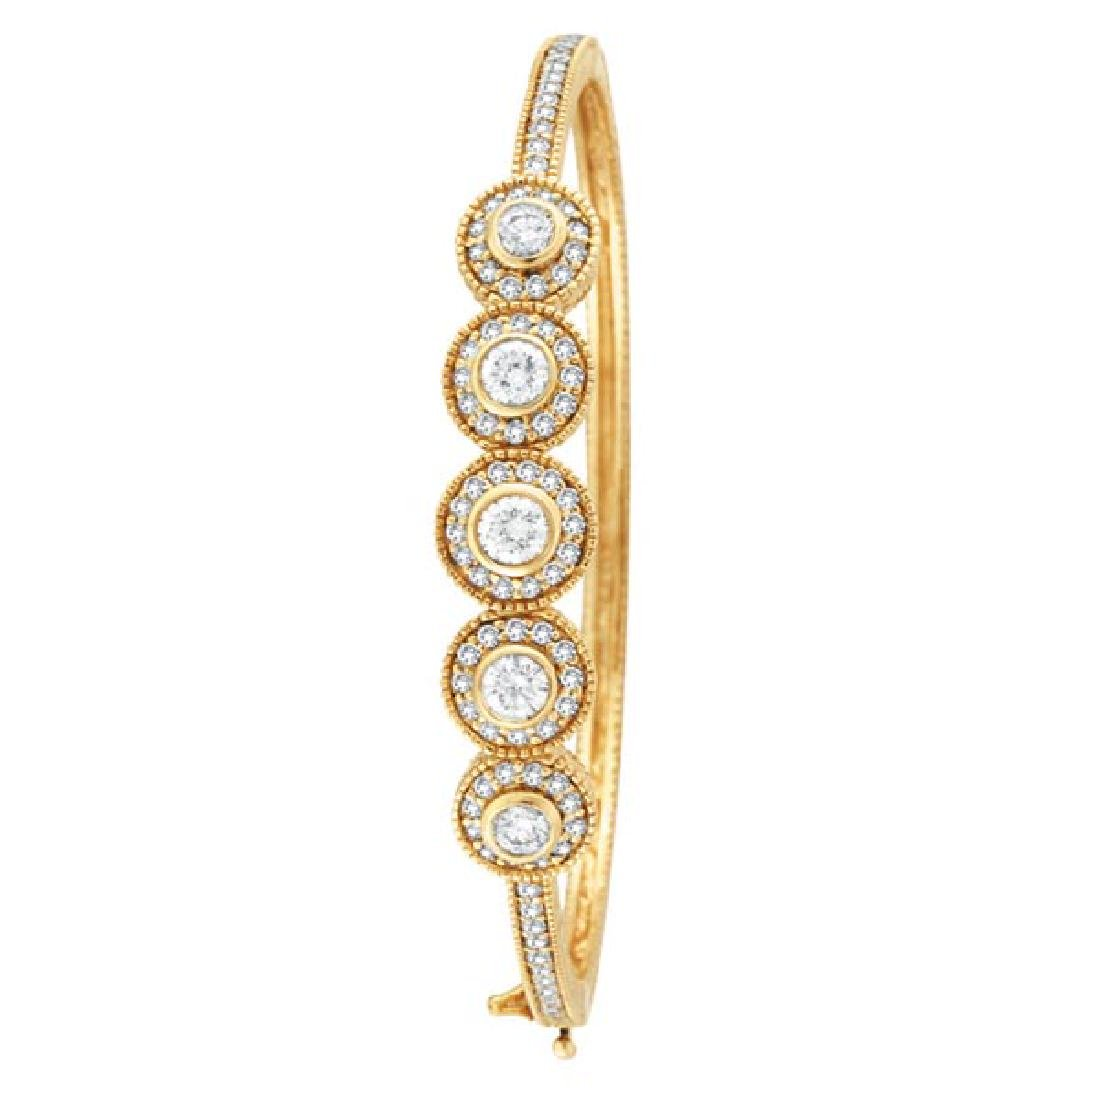 Vintage Style Diamond Bangle Bracelet 18K Yellow Gold (